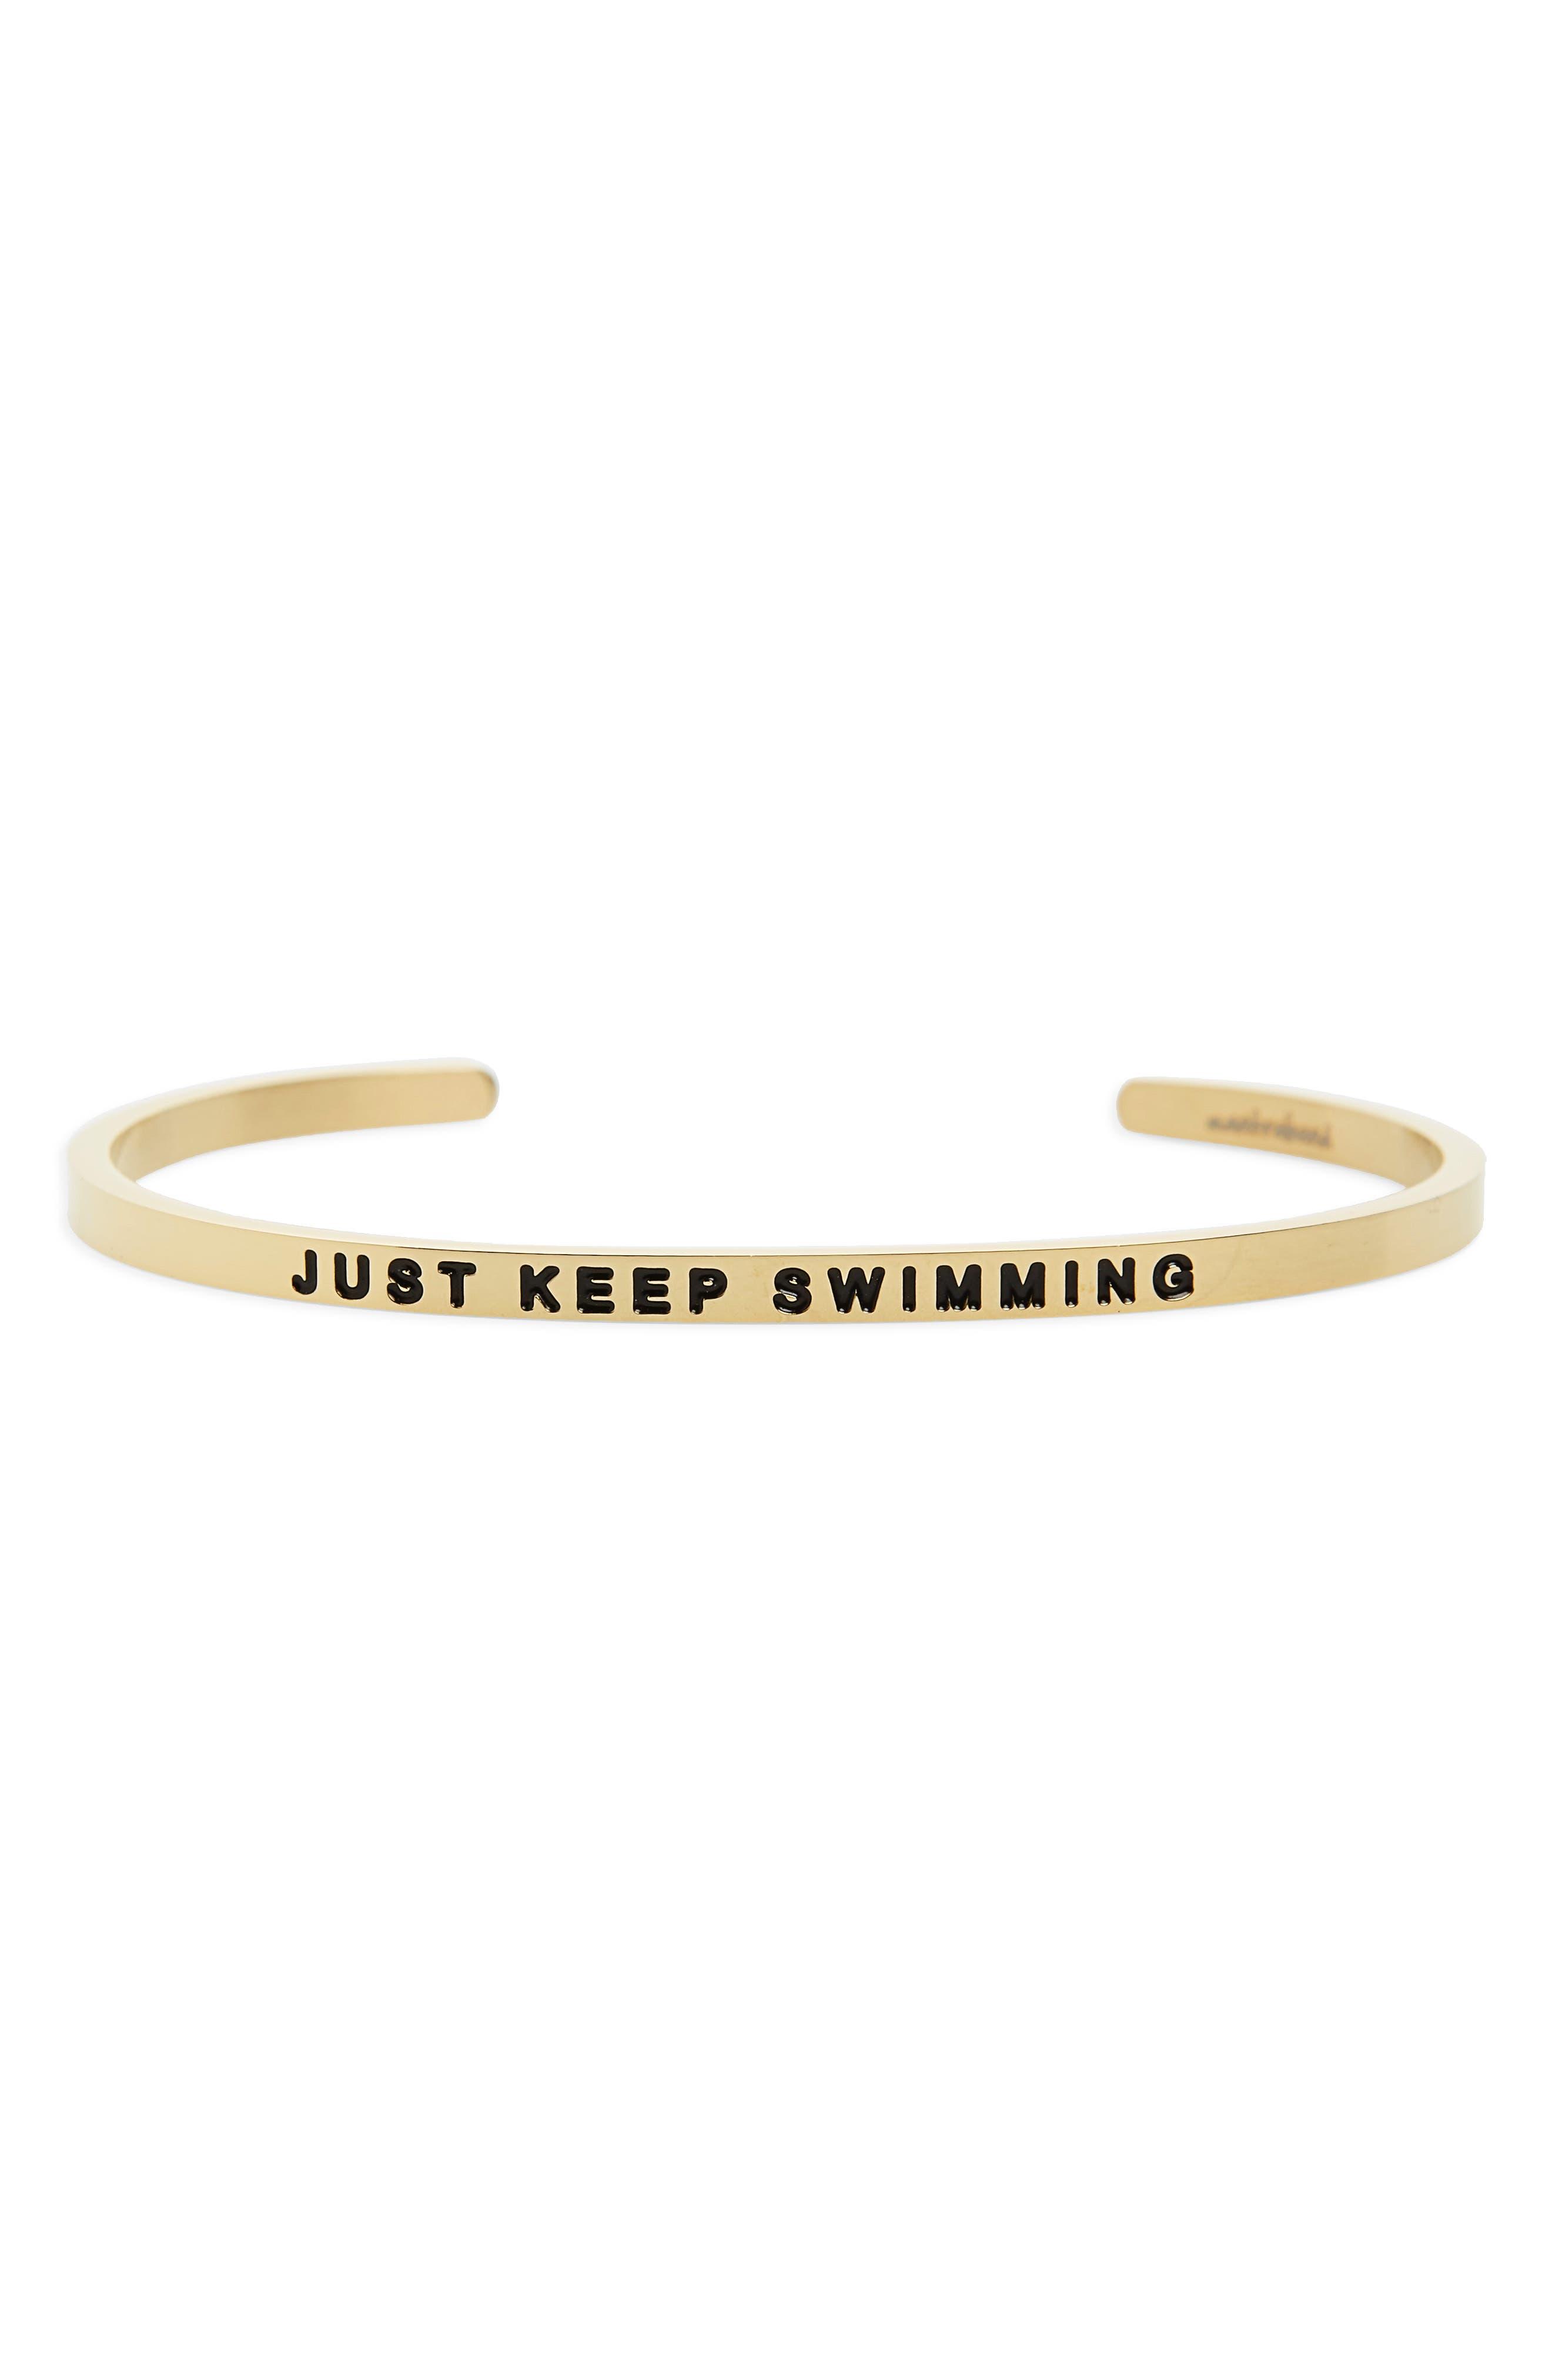 Just Keep Swimming Engraved Cuff,                             Main thumbnail 3, color,